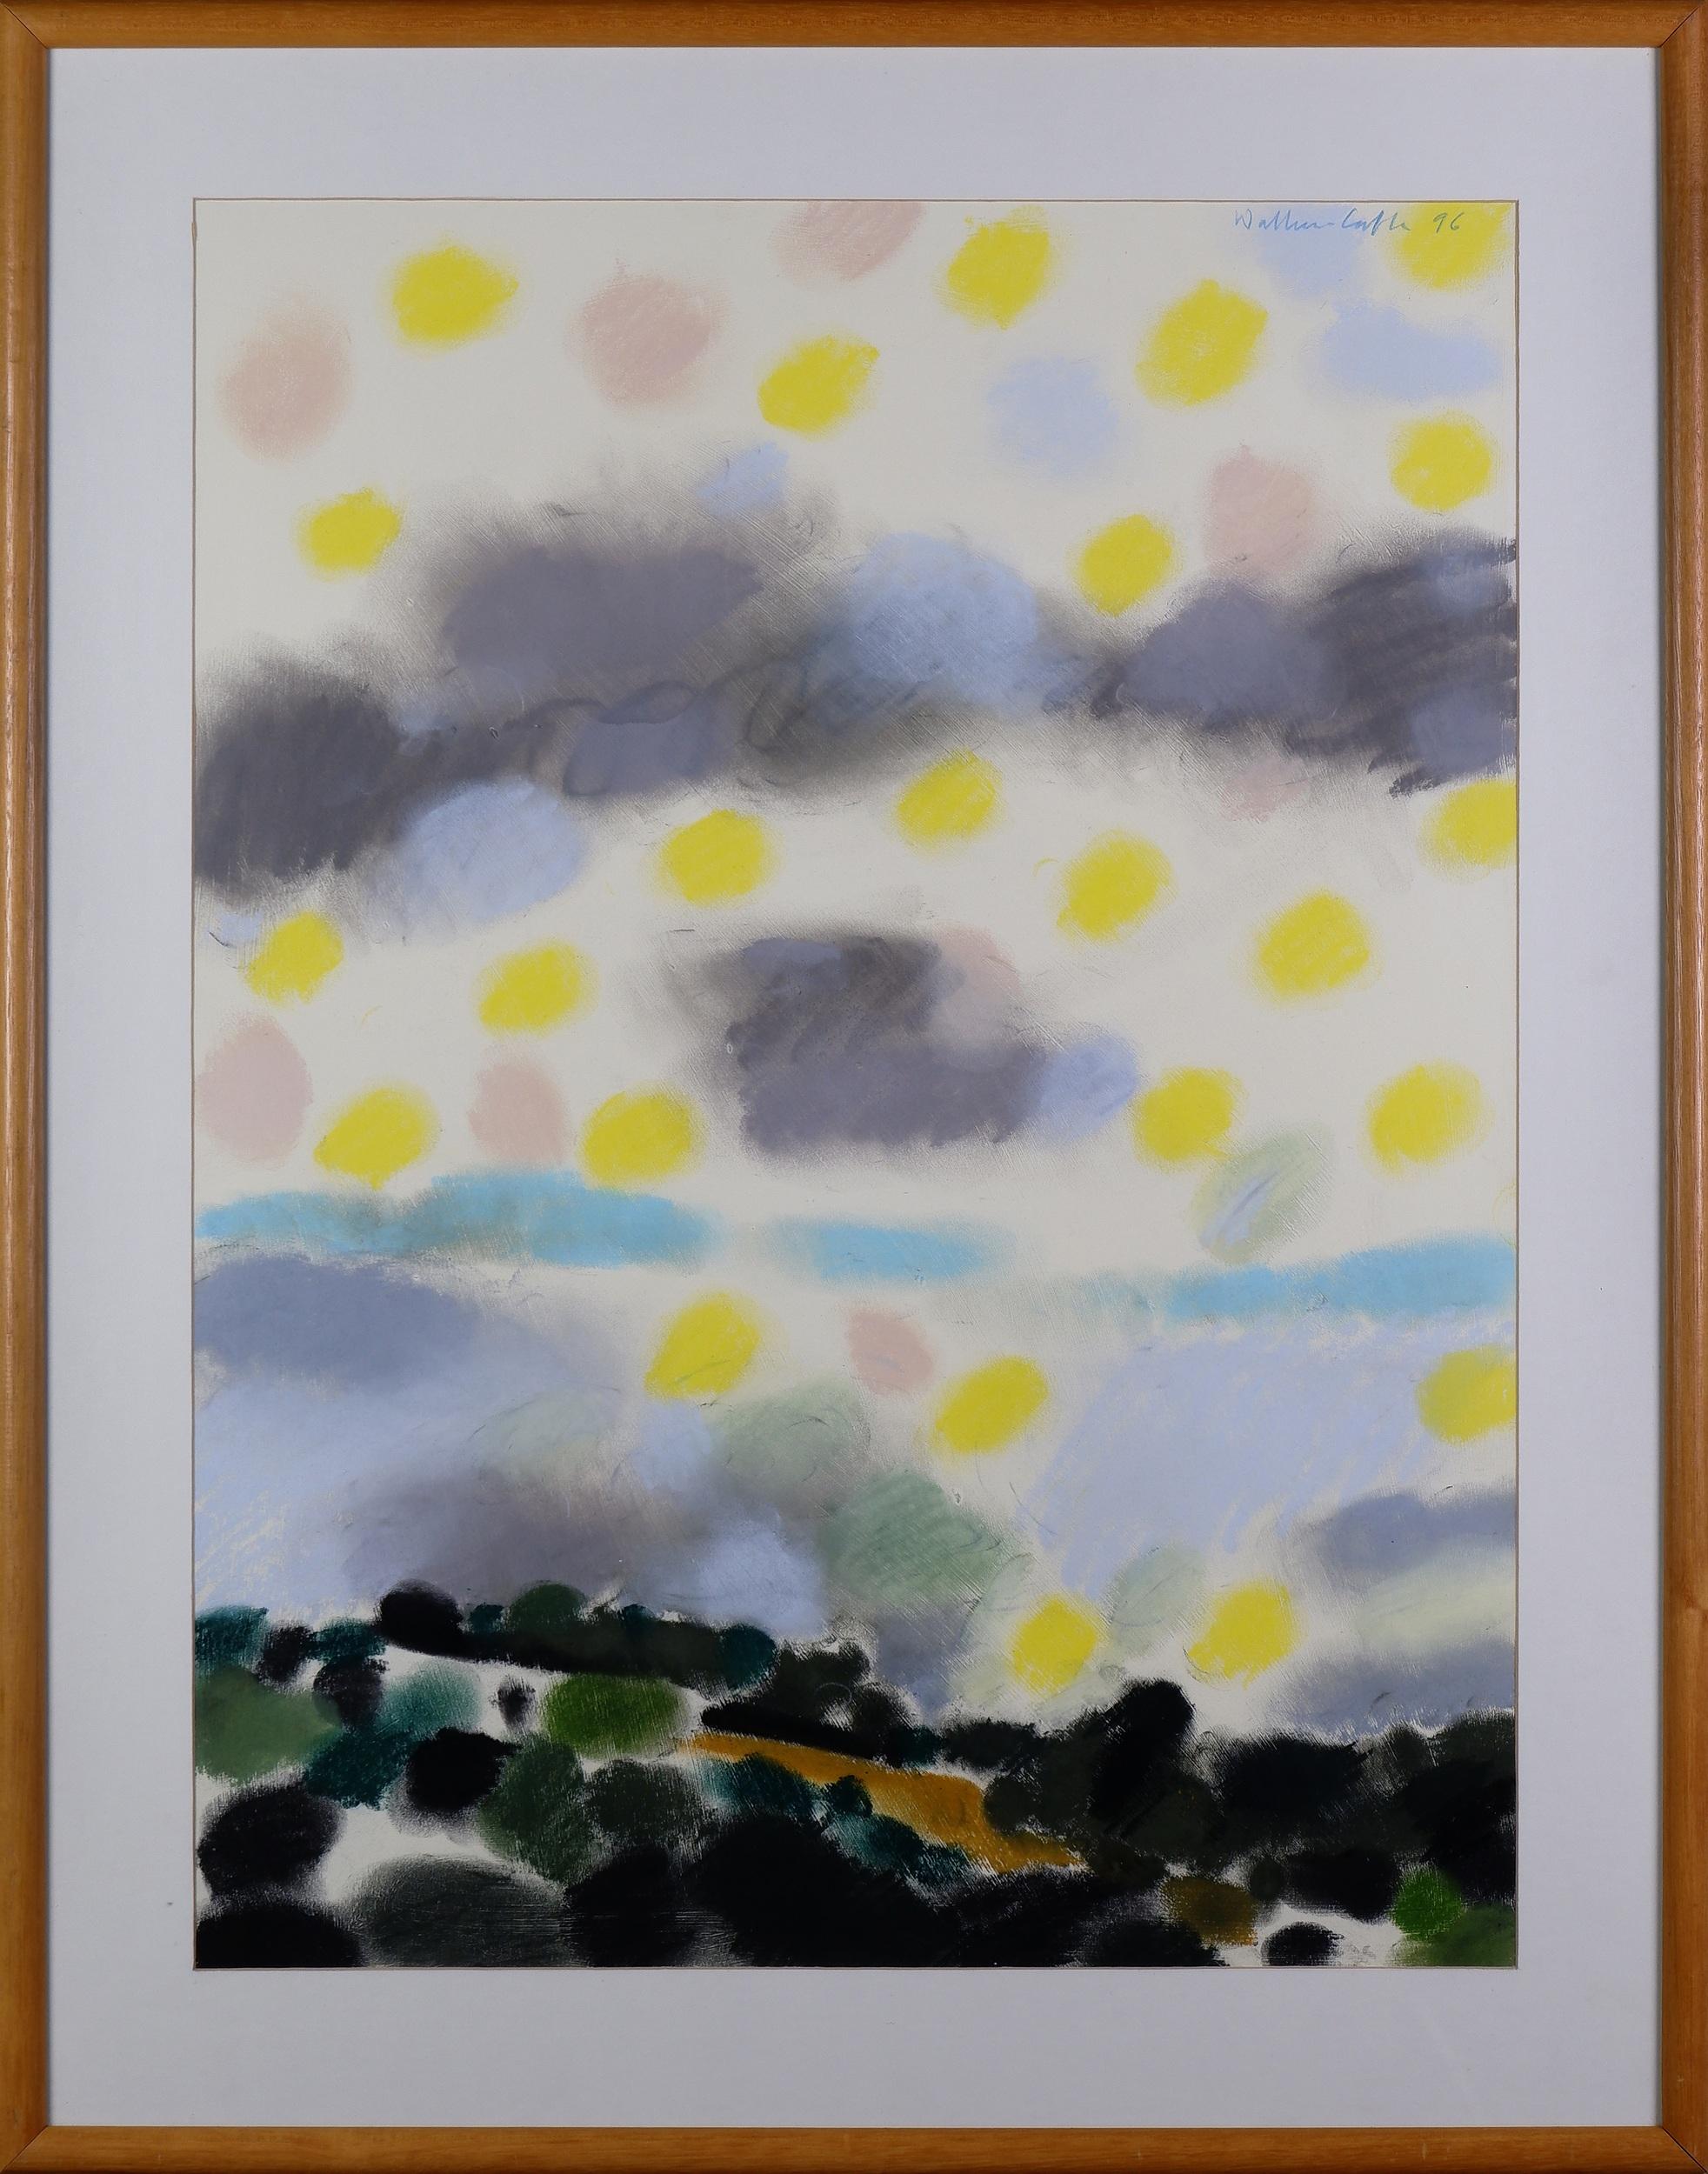 'Robin Wallace-Crabbe (born 1938), Foxhill Landscape 1996, Pastel on Paper'